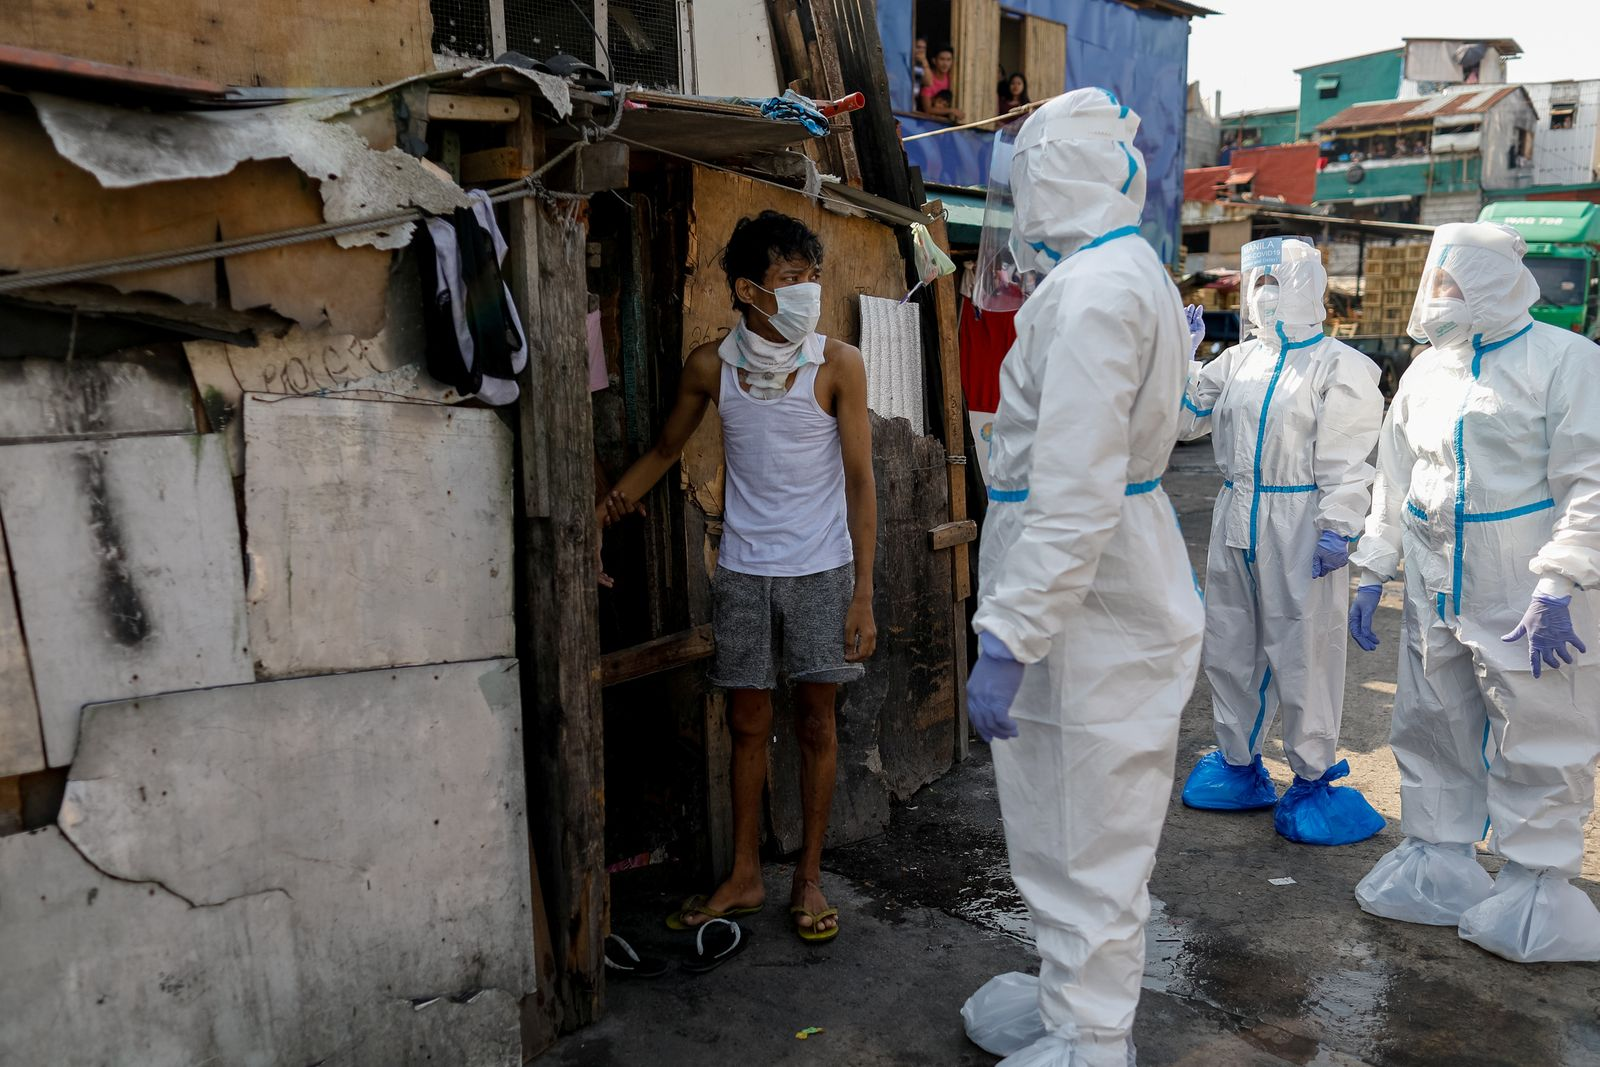 Outbreak of the coronavirus disease (COVID-19) in Philippines